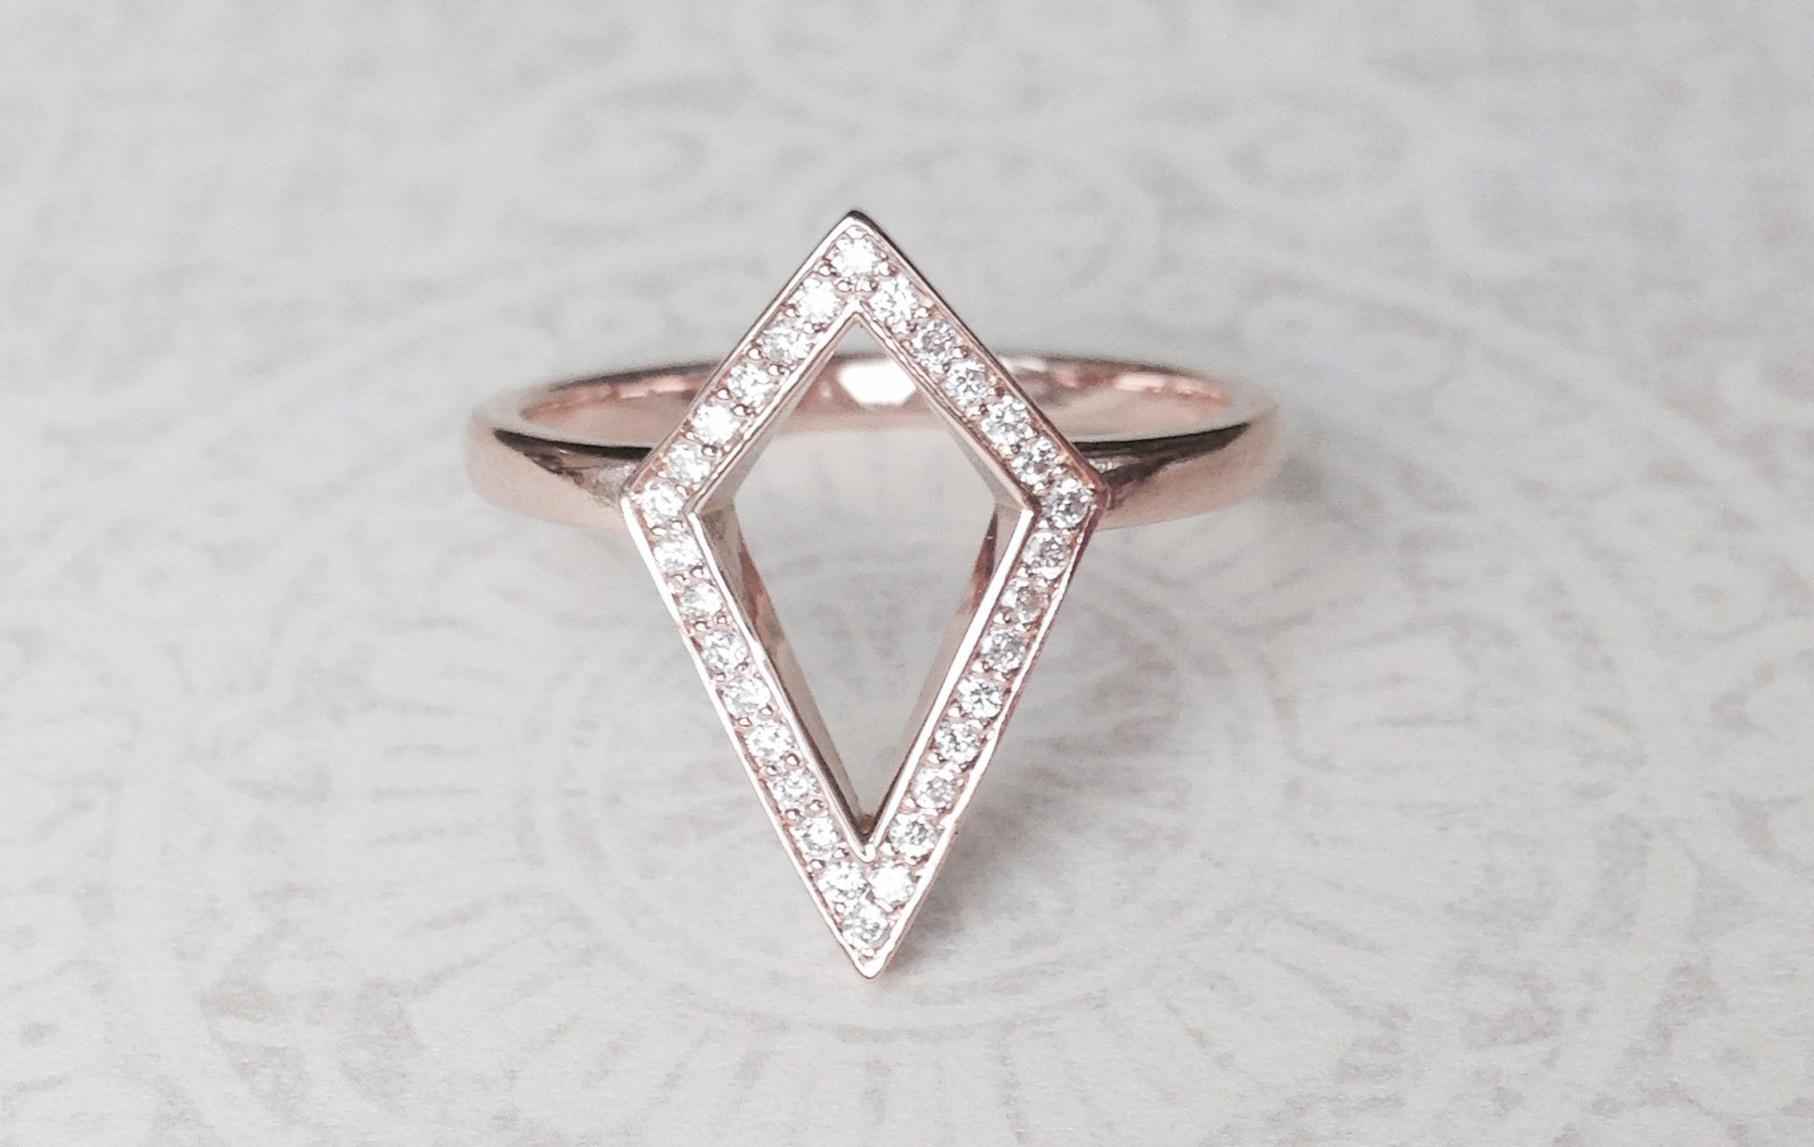 Bespoke Jewellery - rose gold kite ring